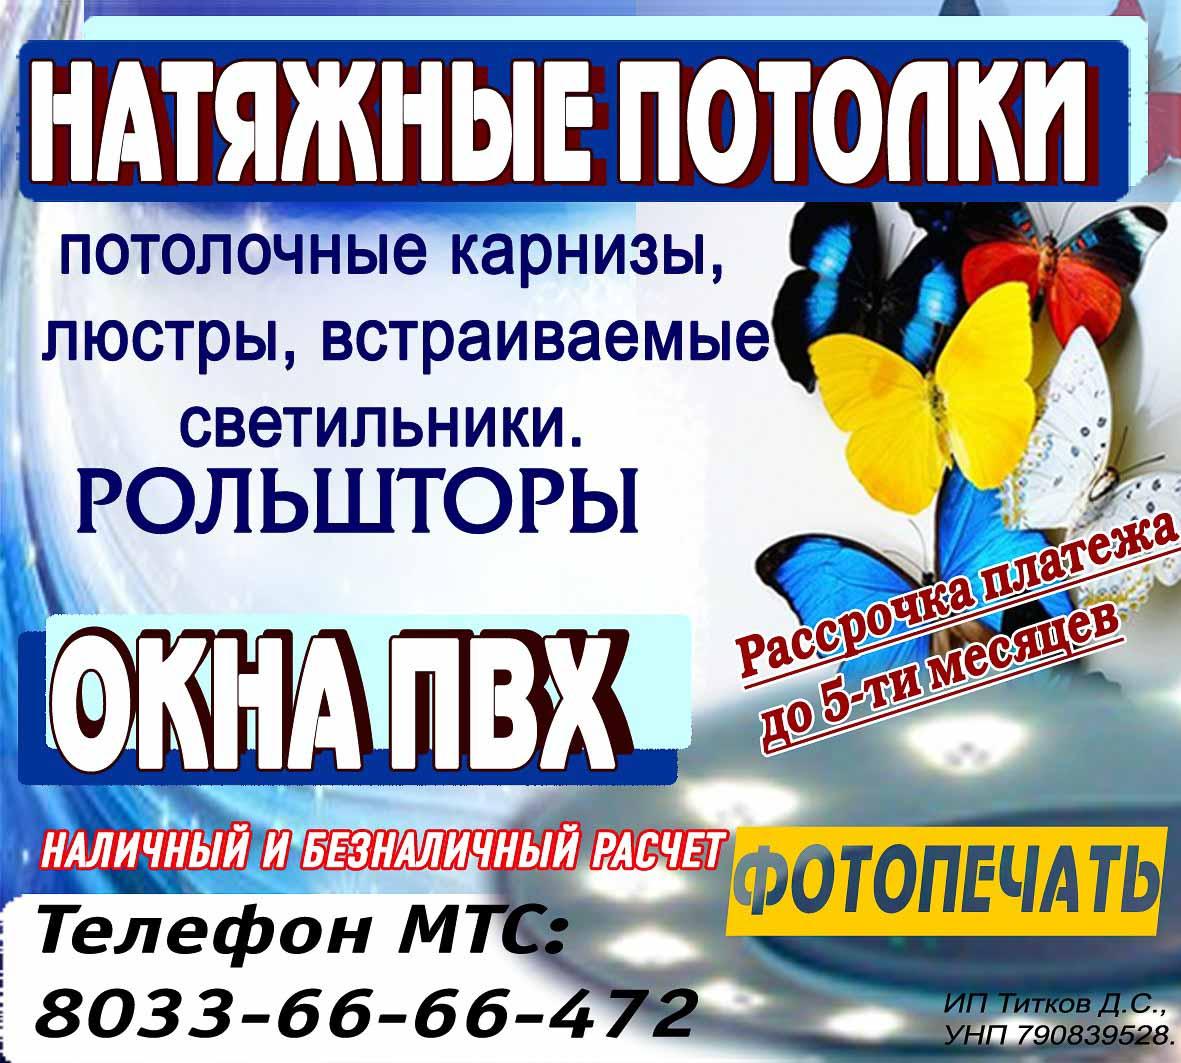 http://www.rodniva.by/wp-content/uploads/2016/04/ИП-Титков-на-сайт-258369.jpg